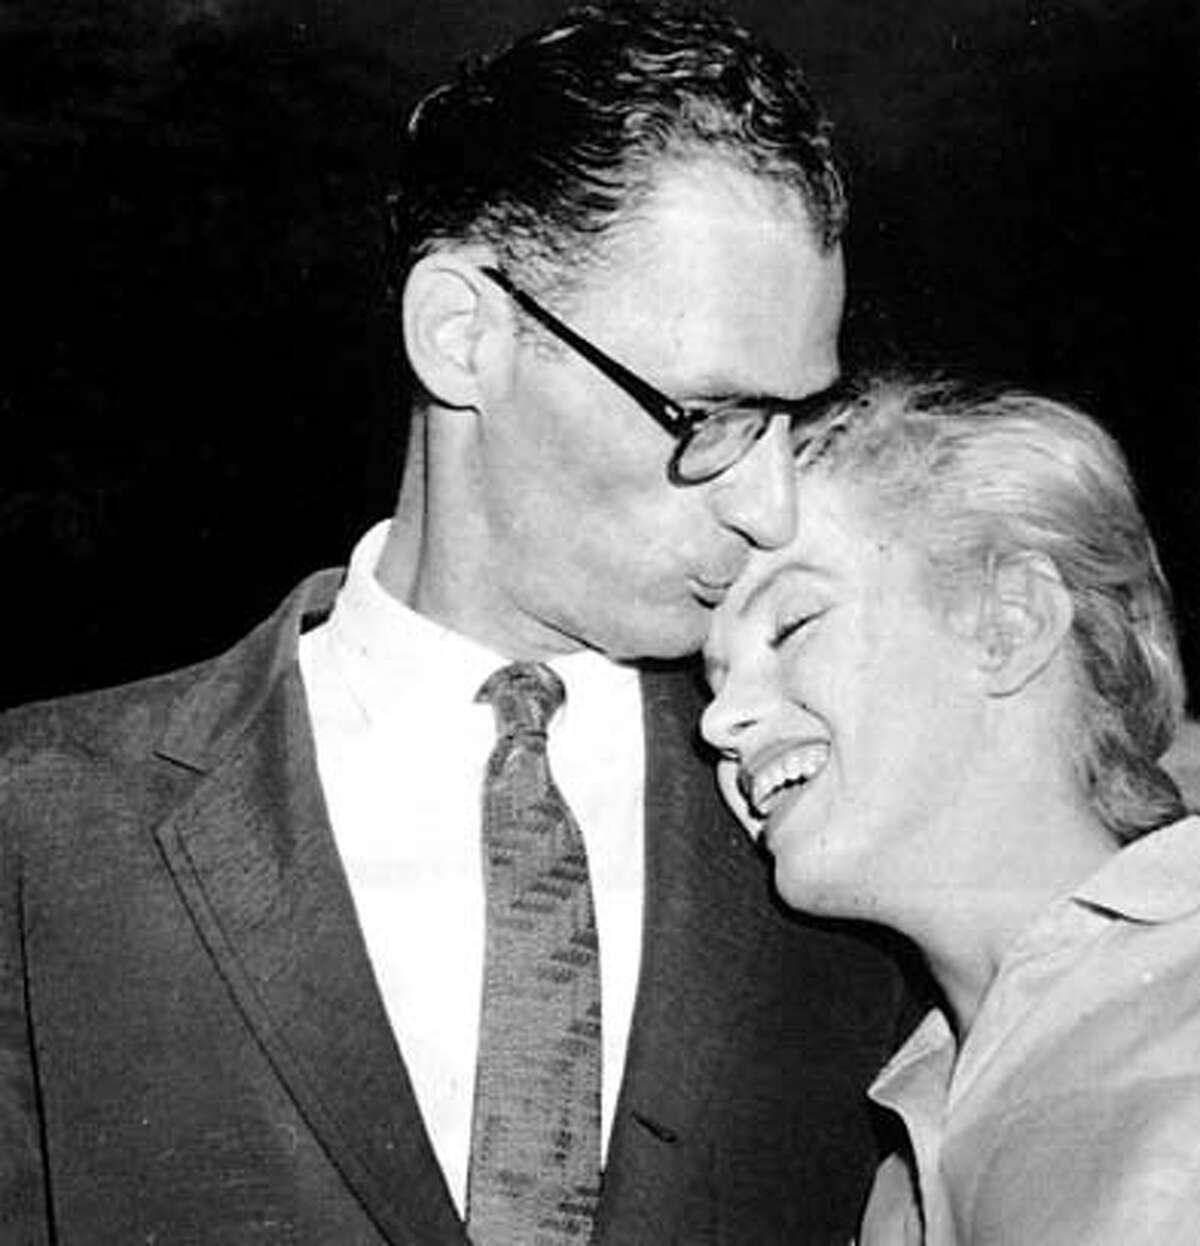 ARTHUR MILLER AND MARILYN MONROE, 1956